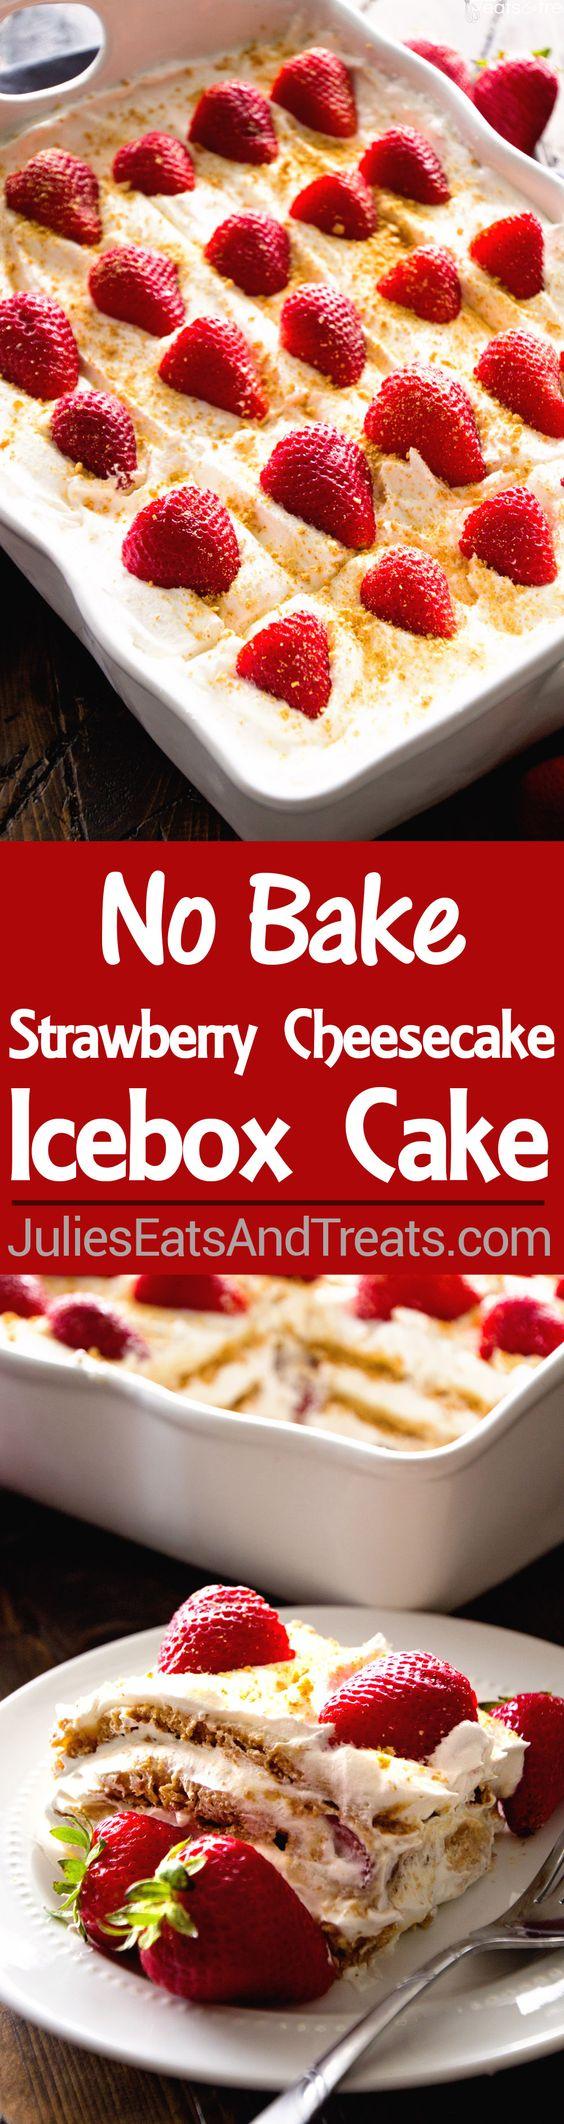 No Bake Strawberry Cheesecake Icebox Cake Recipe ~ This Easy, No-Bake ...